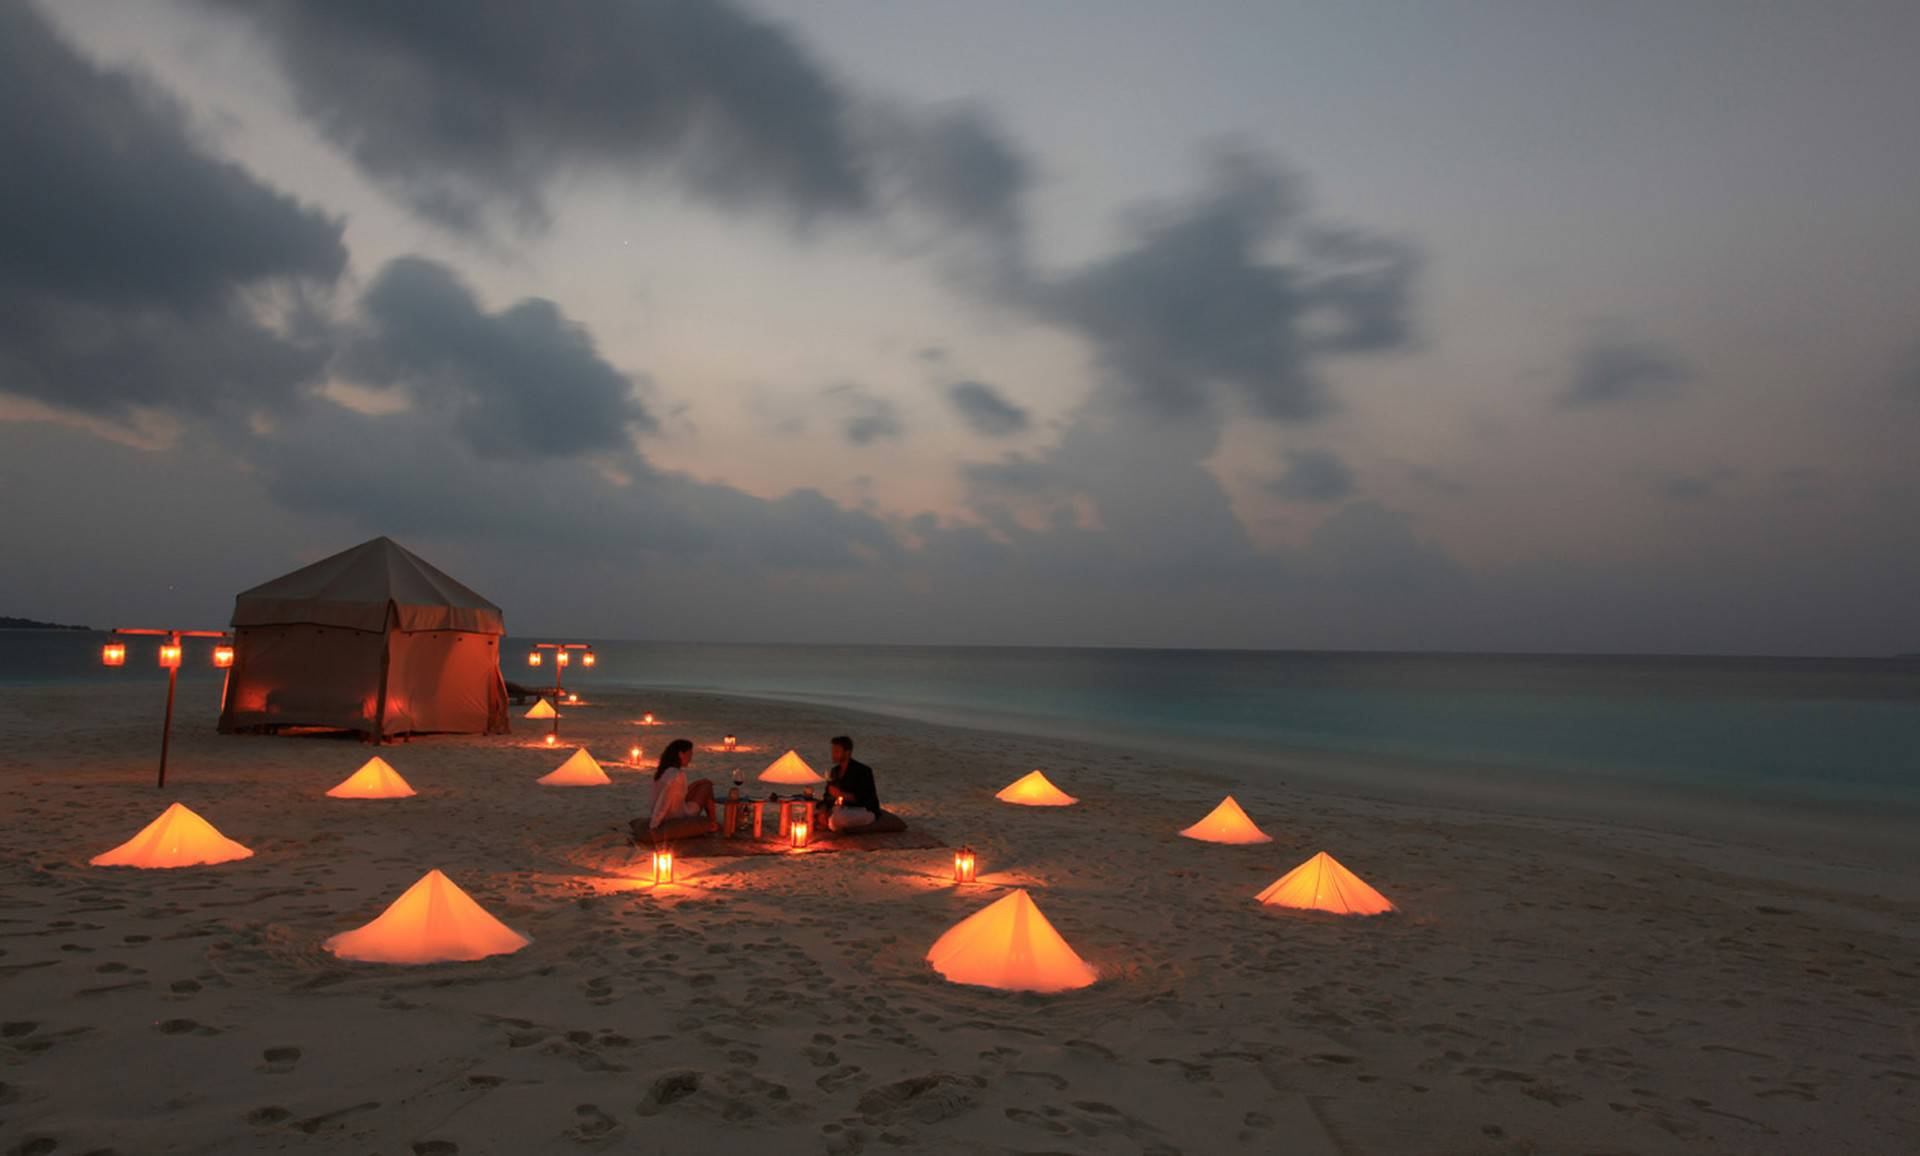 Romantic dinner picnics on the sand bank